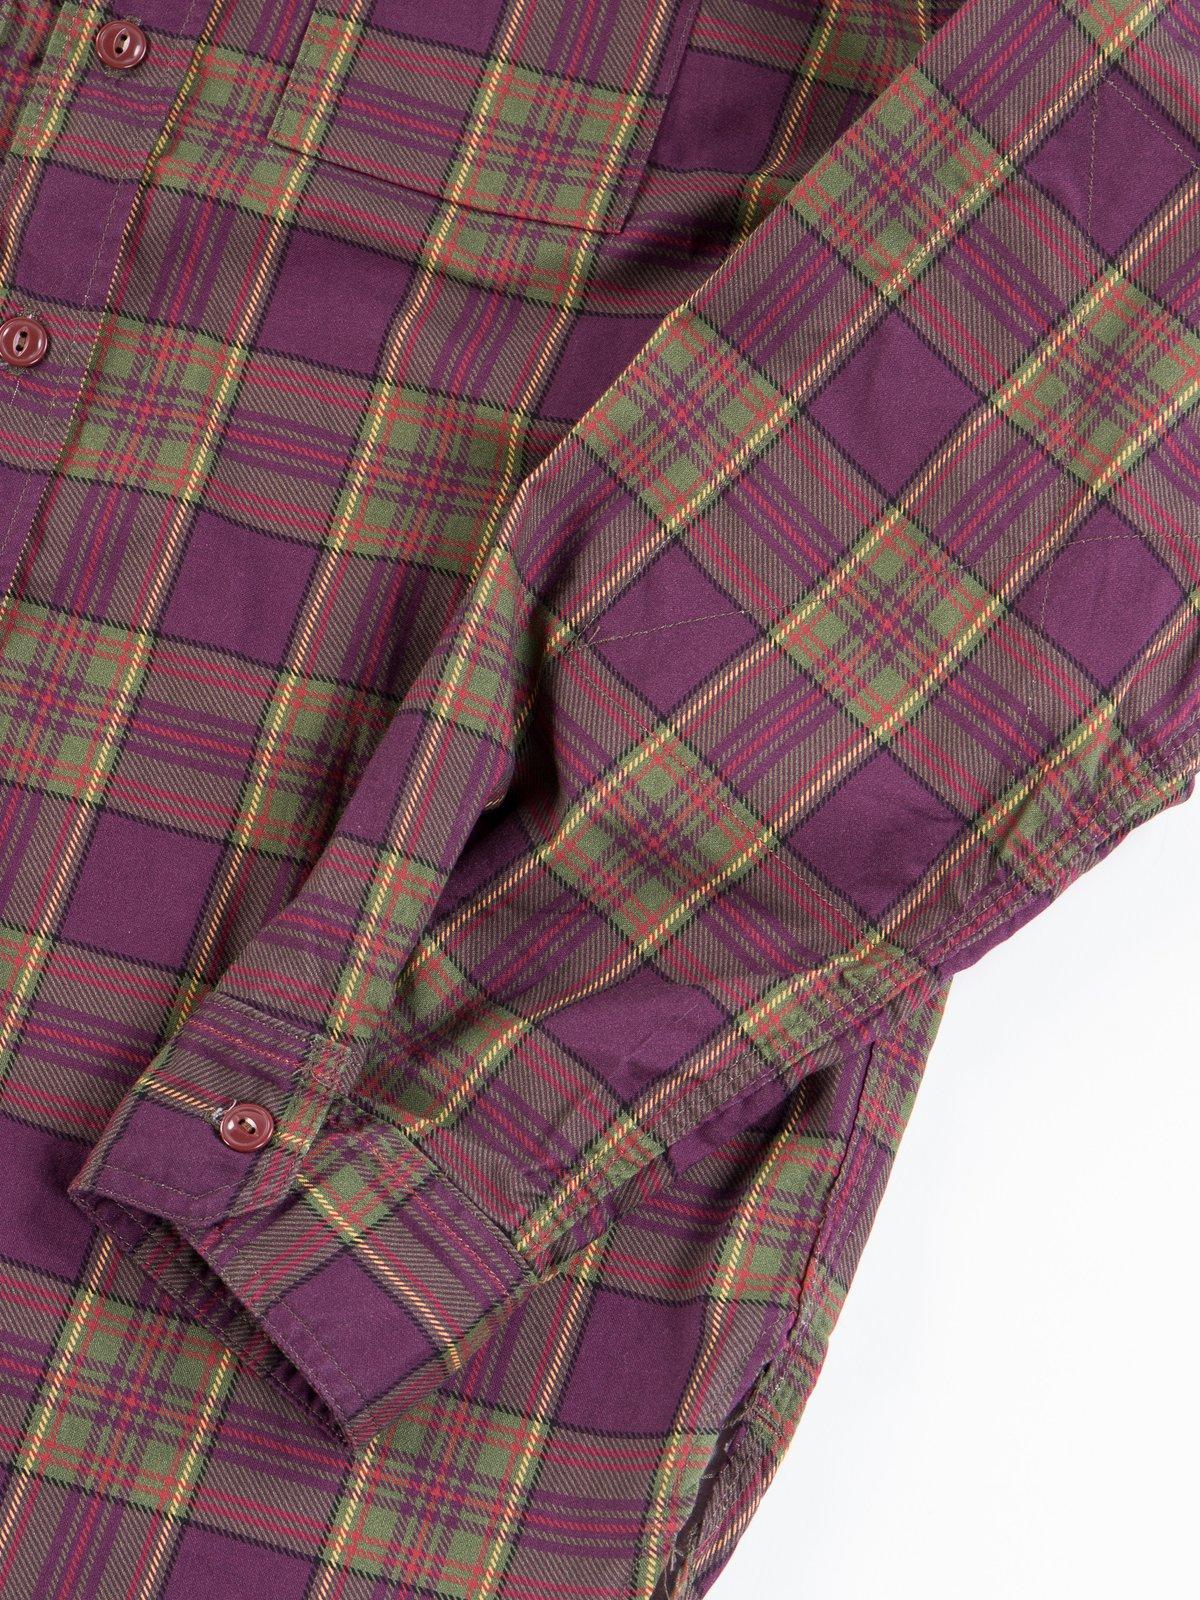 Purple/Green Cotton Printed Plaid Work Shirt - Image 5